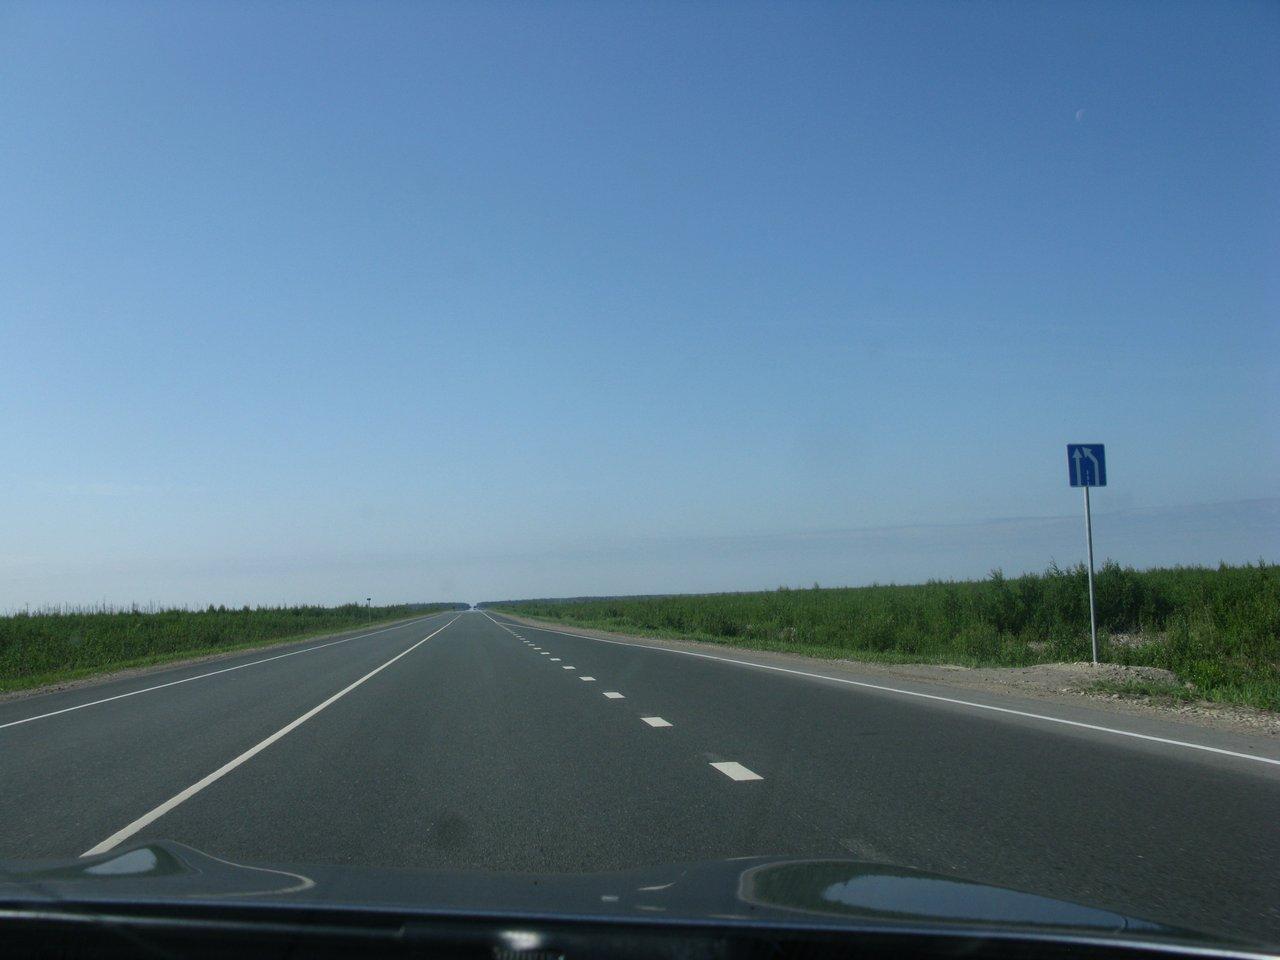 Трасса Йошкар-Ола - Чебоксары